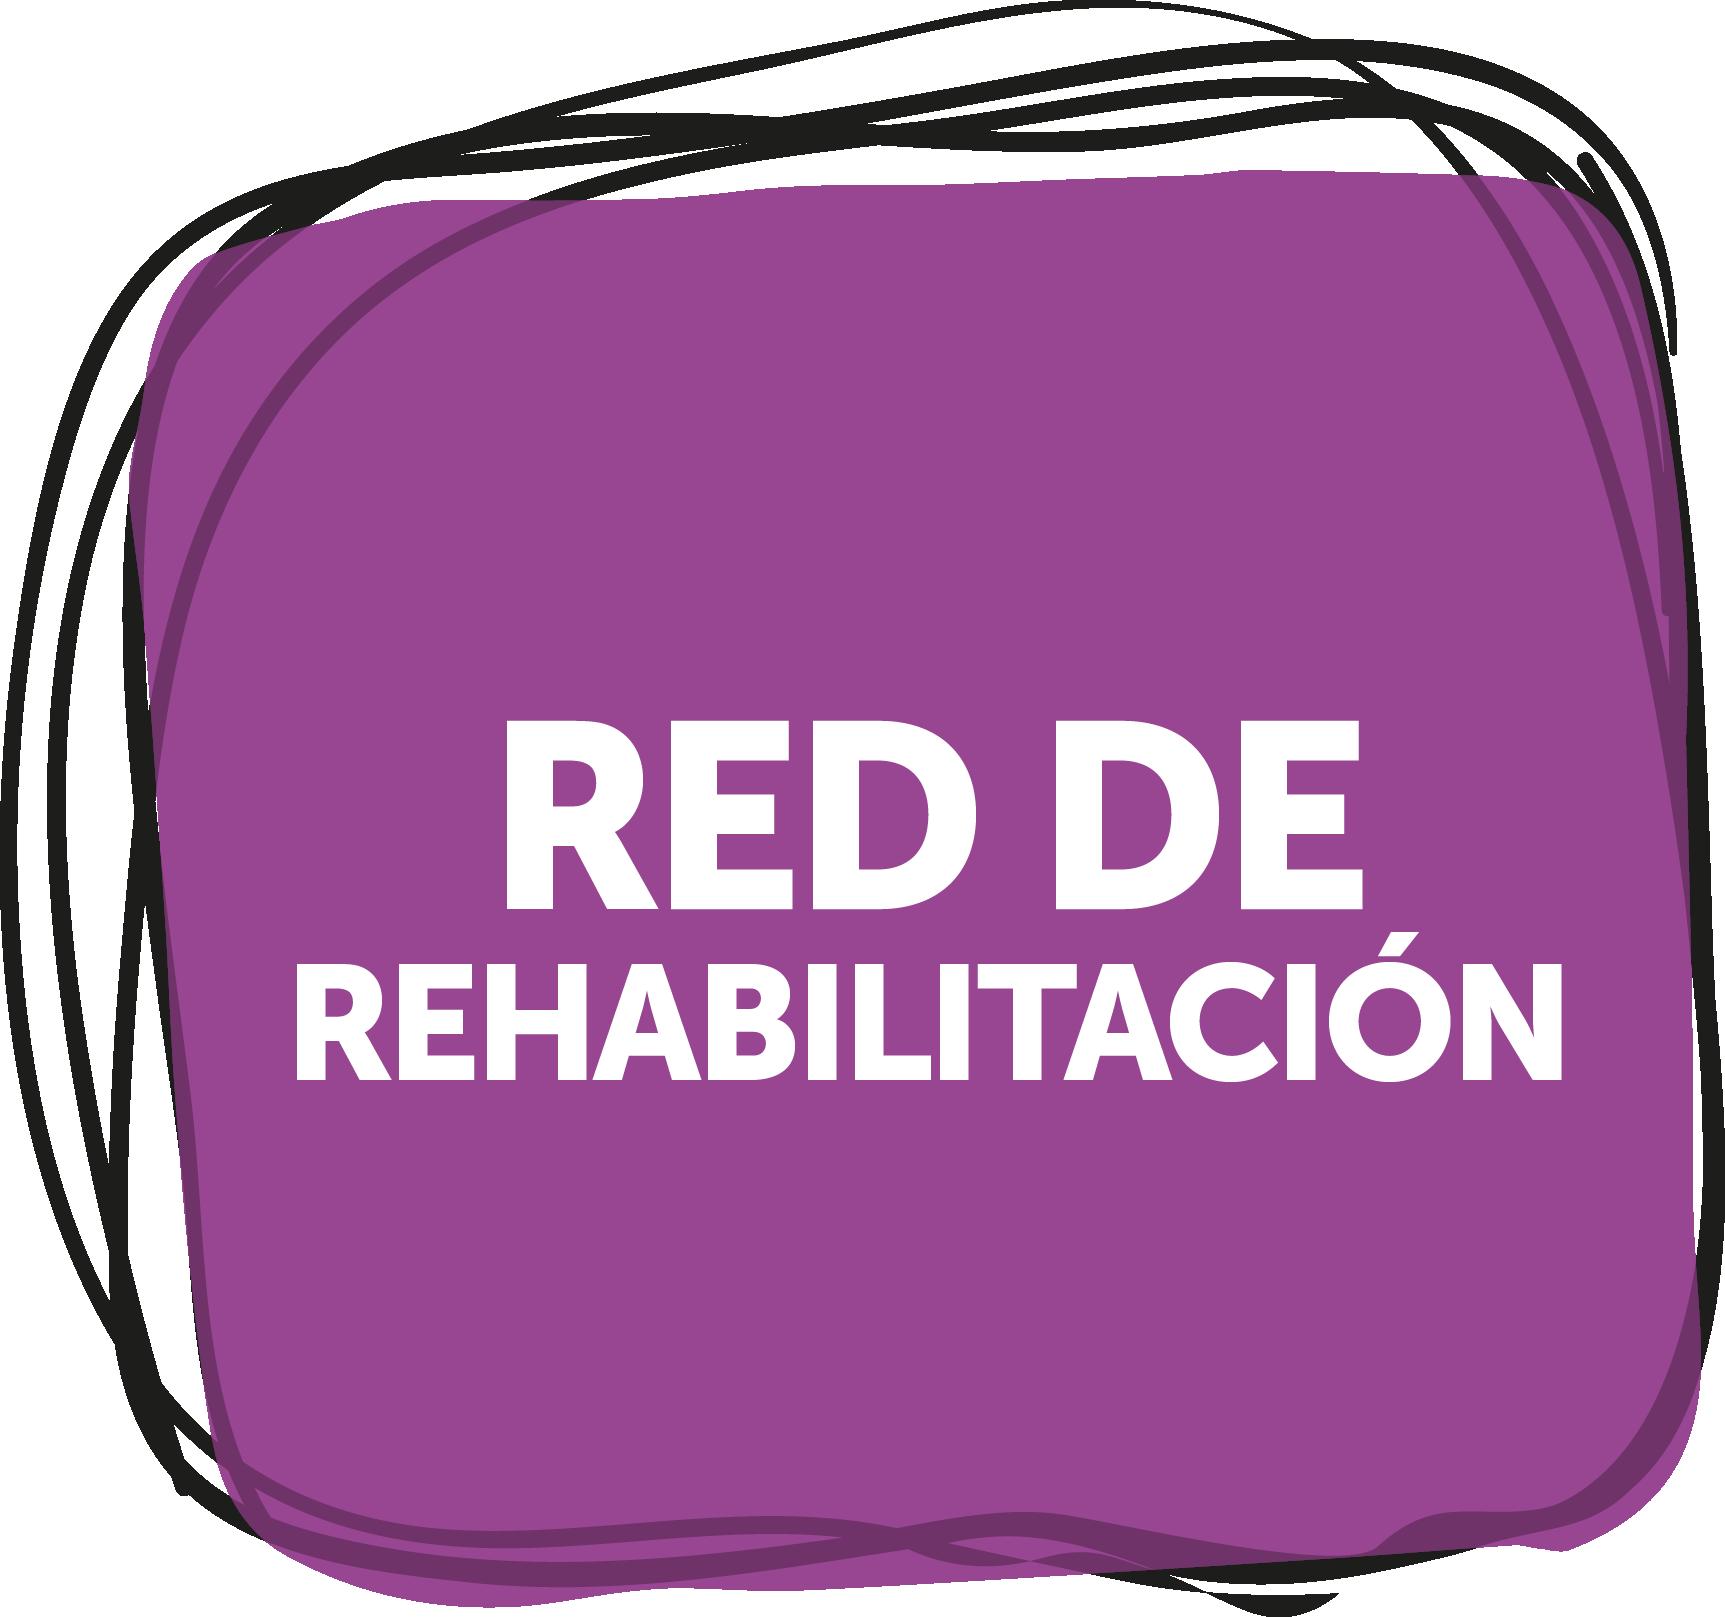 RED REHABILITACION